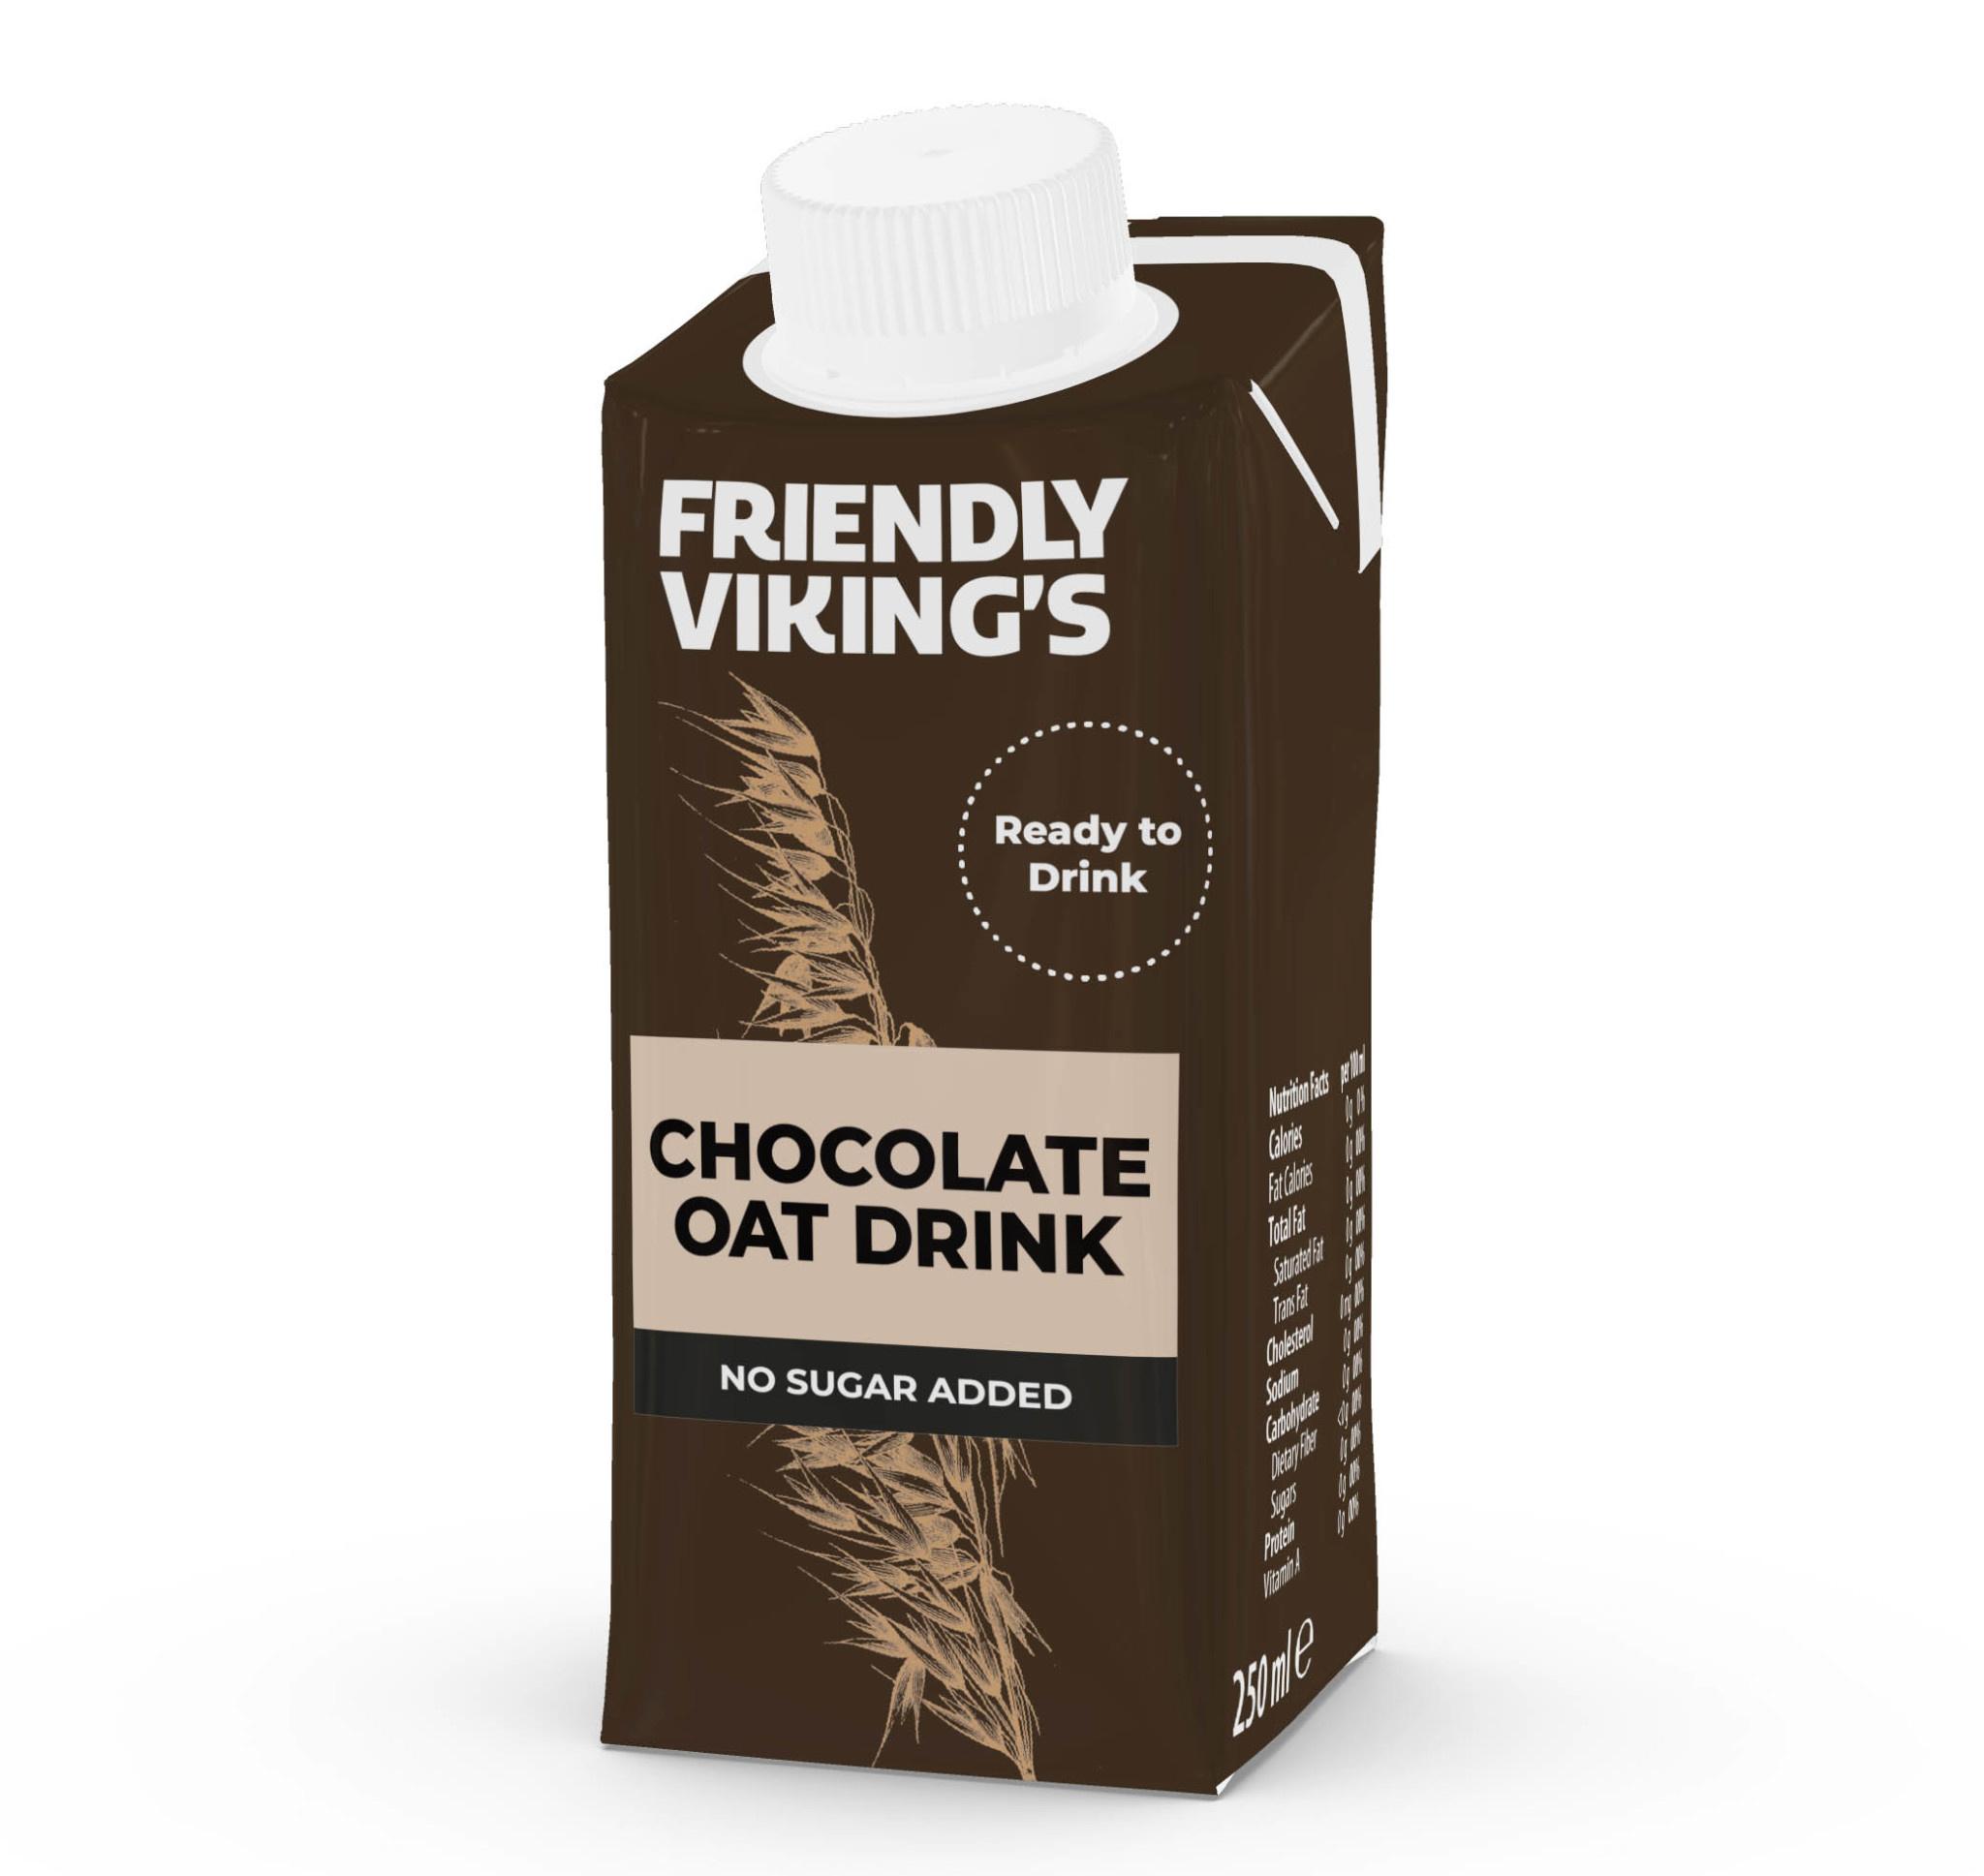 FRIENDLY VIKING'S FRIENDLY VIKING'S Oat Drink - Chocolate